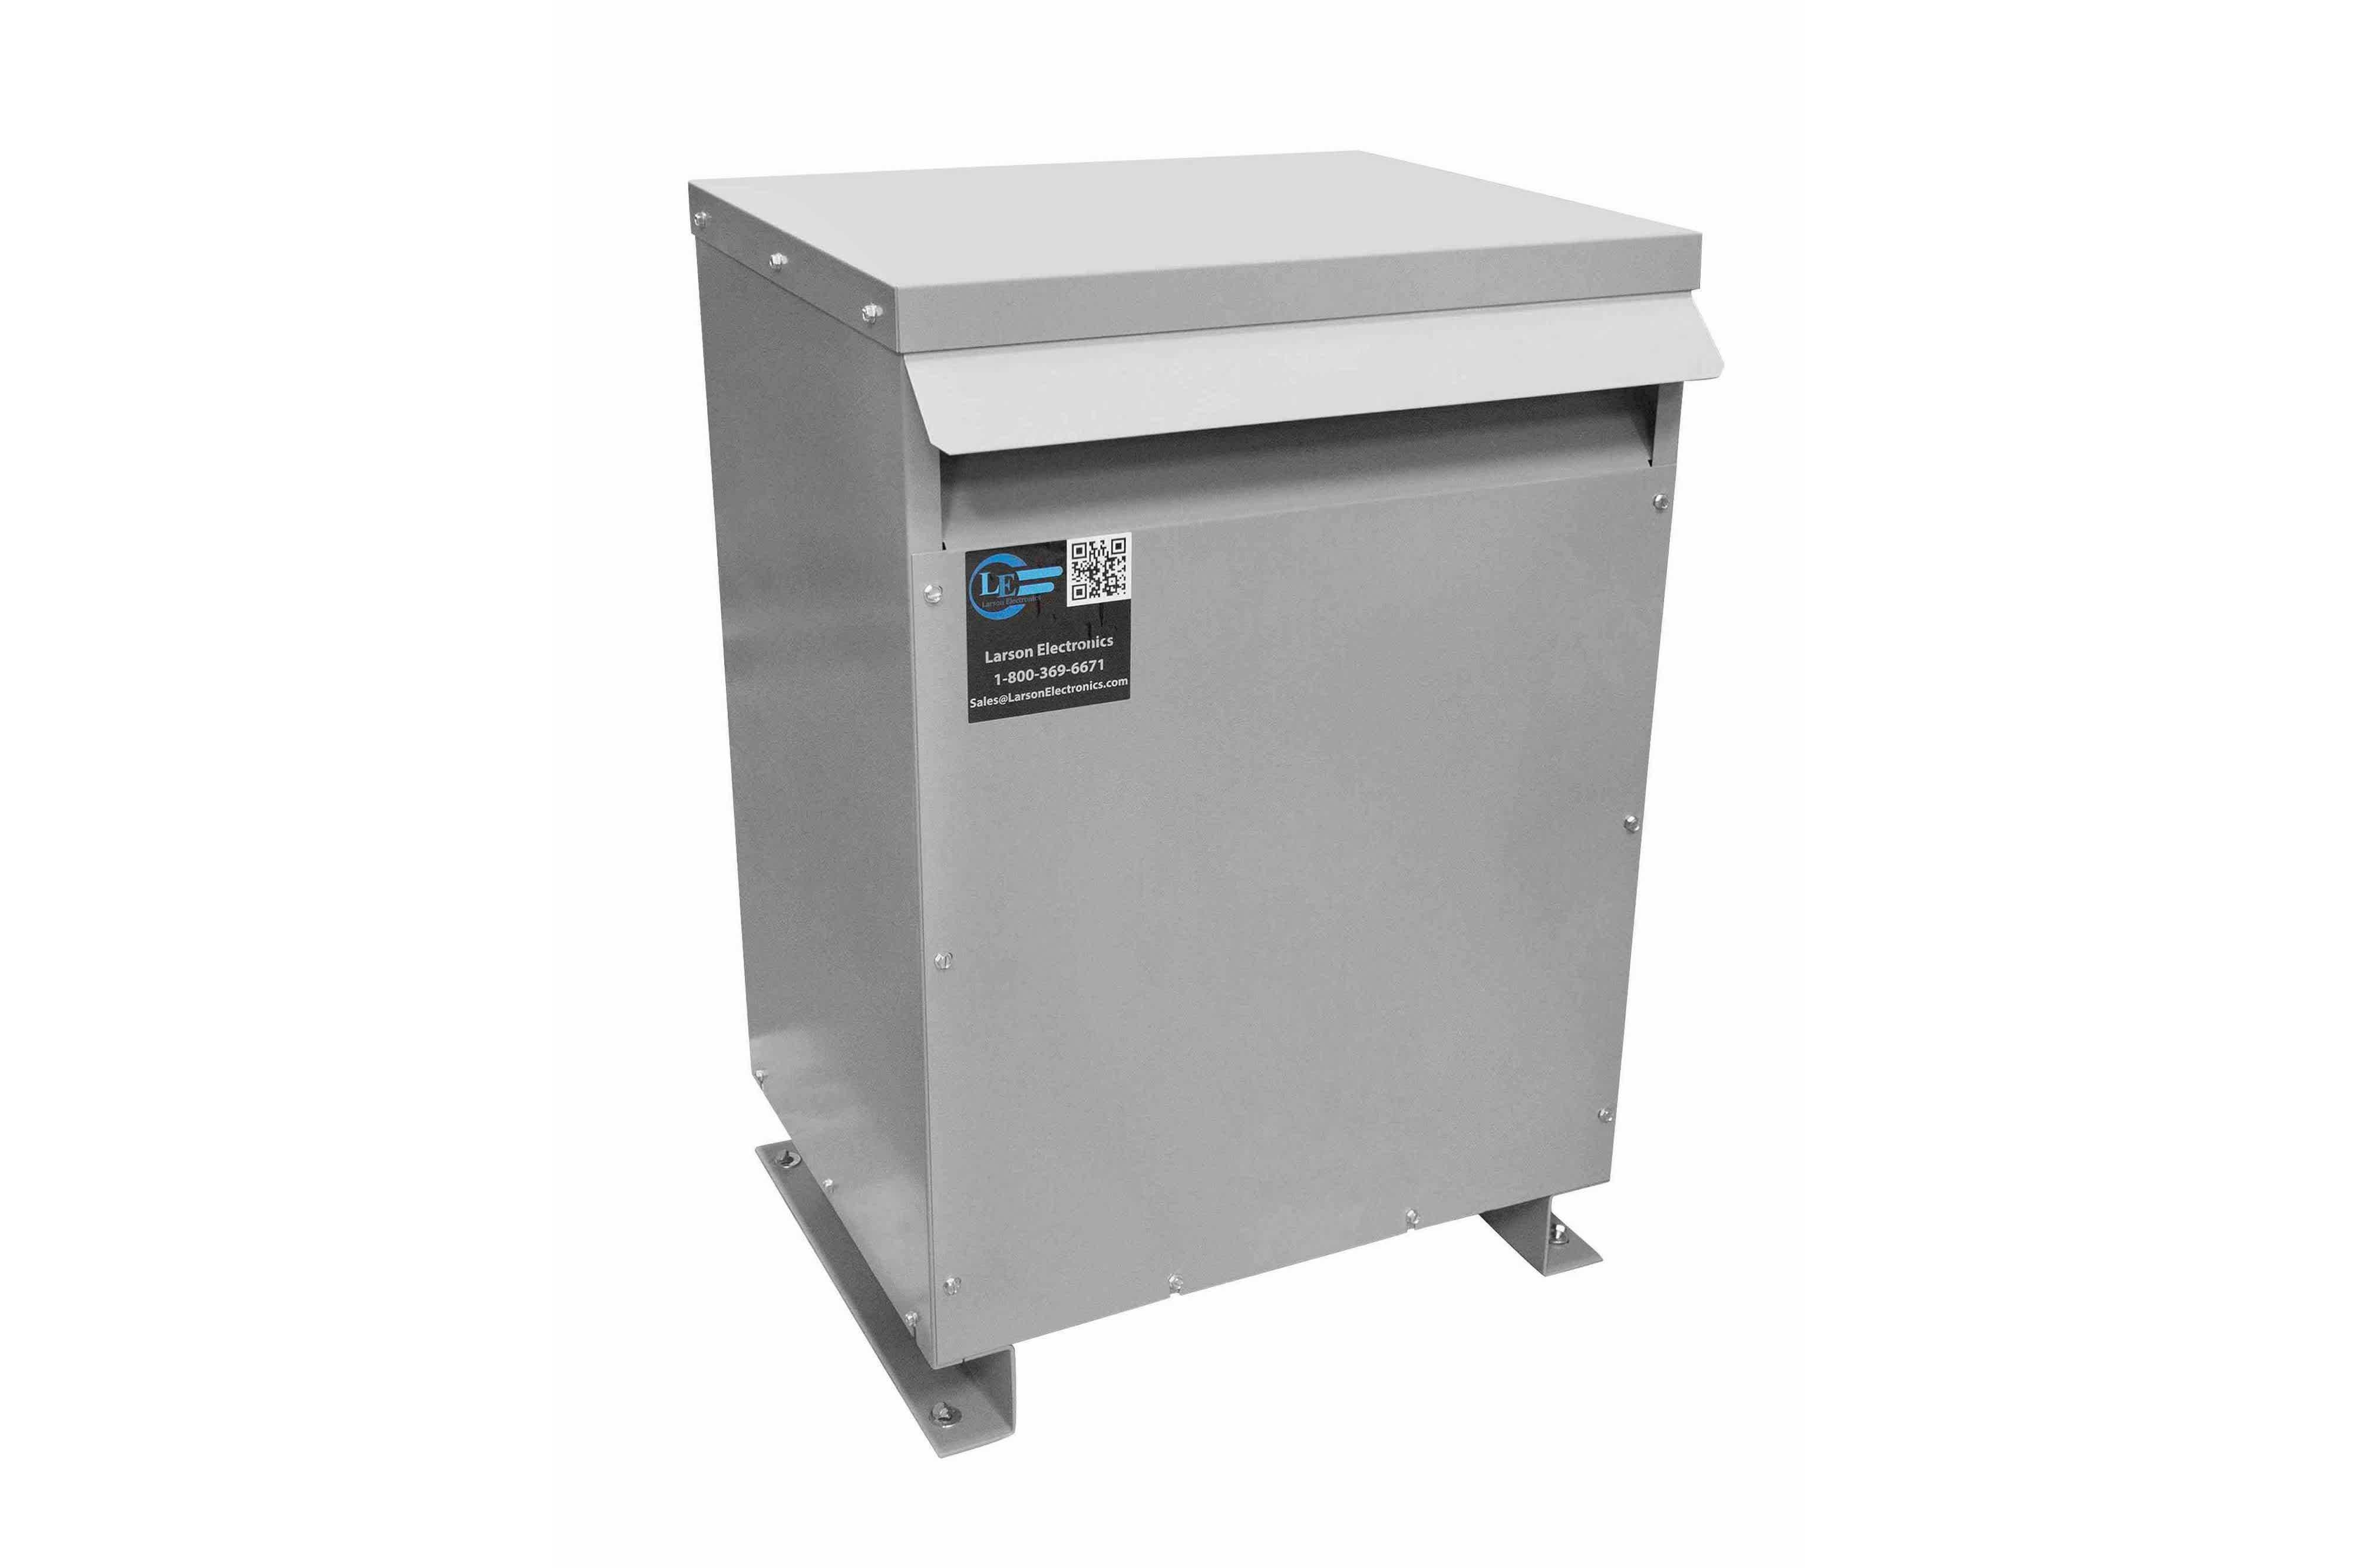 20 kVA 3PH Isolation Transformer, 380V Wye Primary, 208Y/120 Wye-N Secondary, N3R, Ventilated, 60 Hz